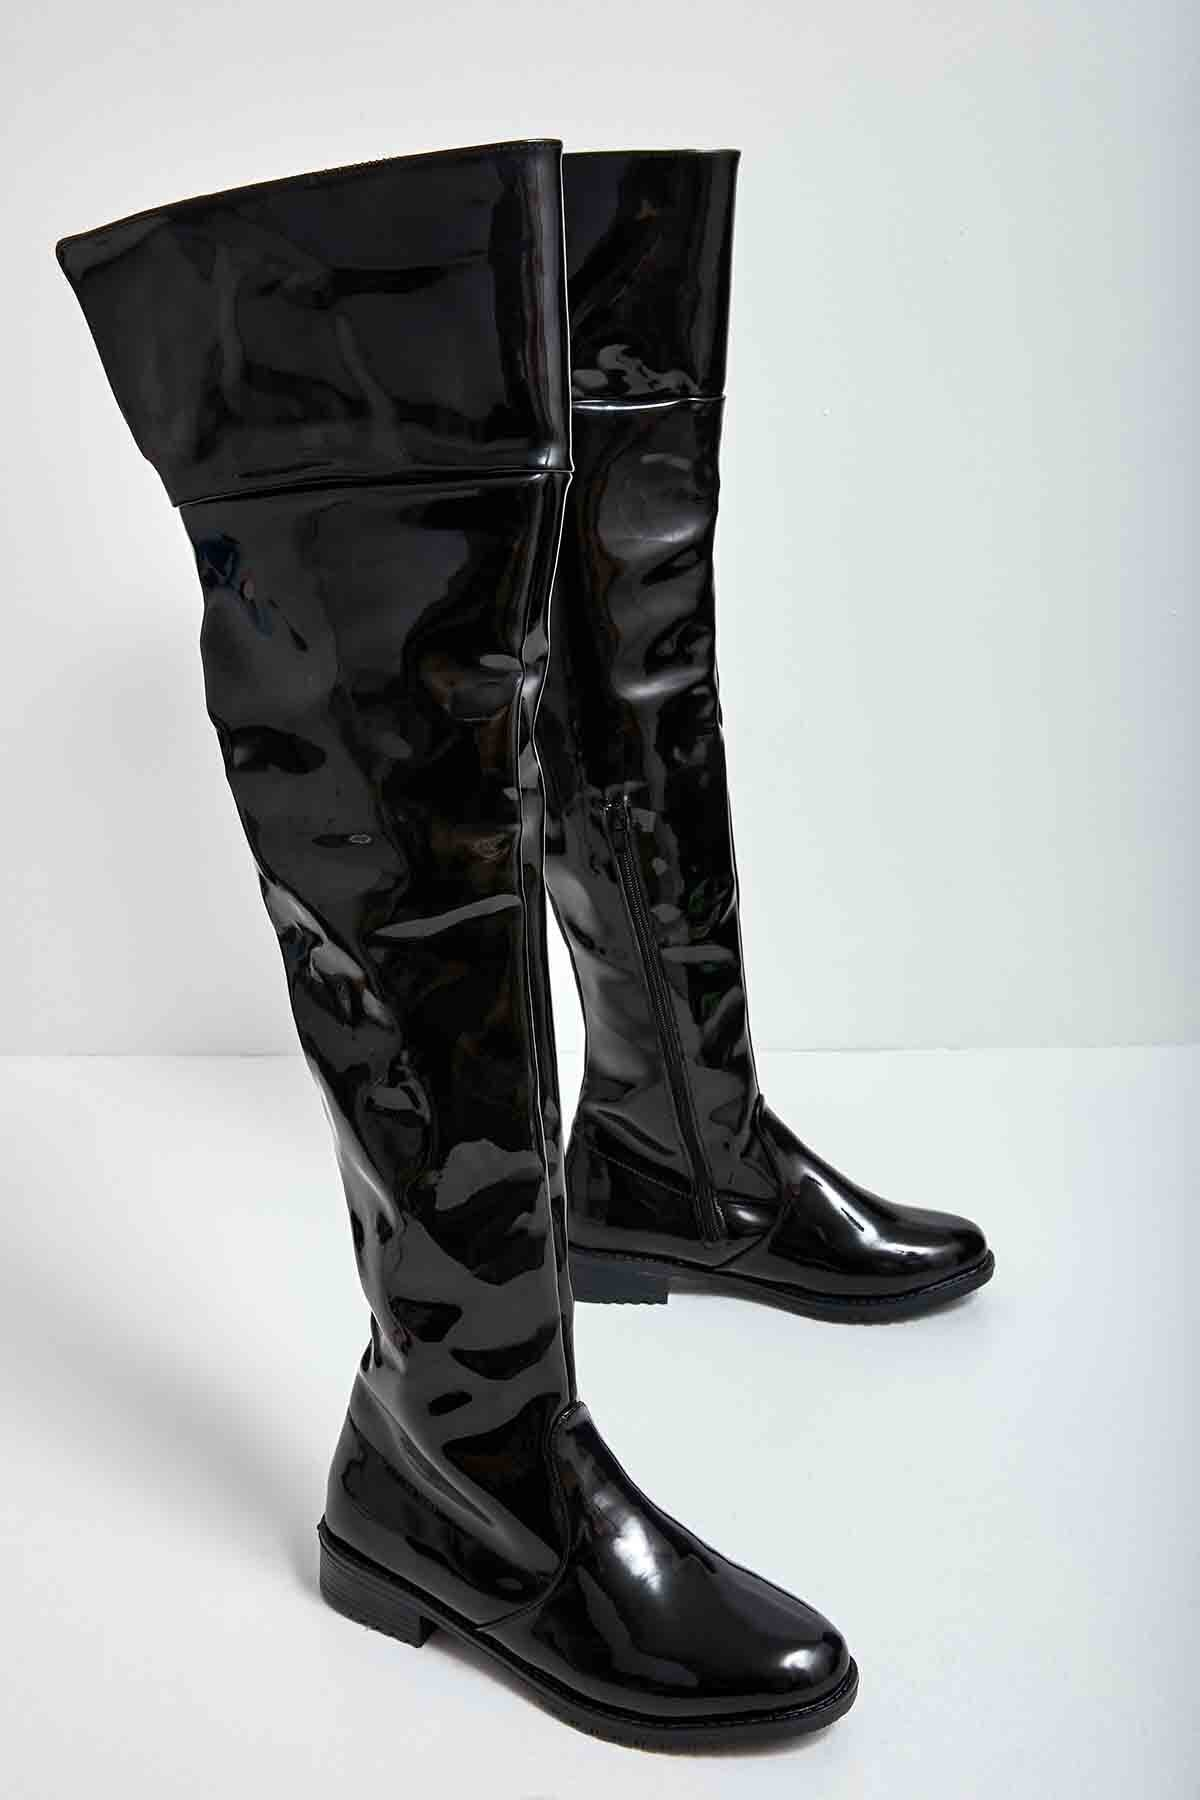 Bambi Siyah Rugan Kadın Çizme M0503306098 2